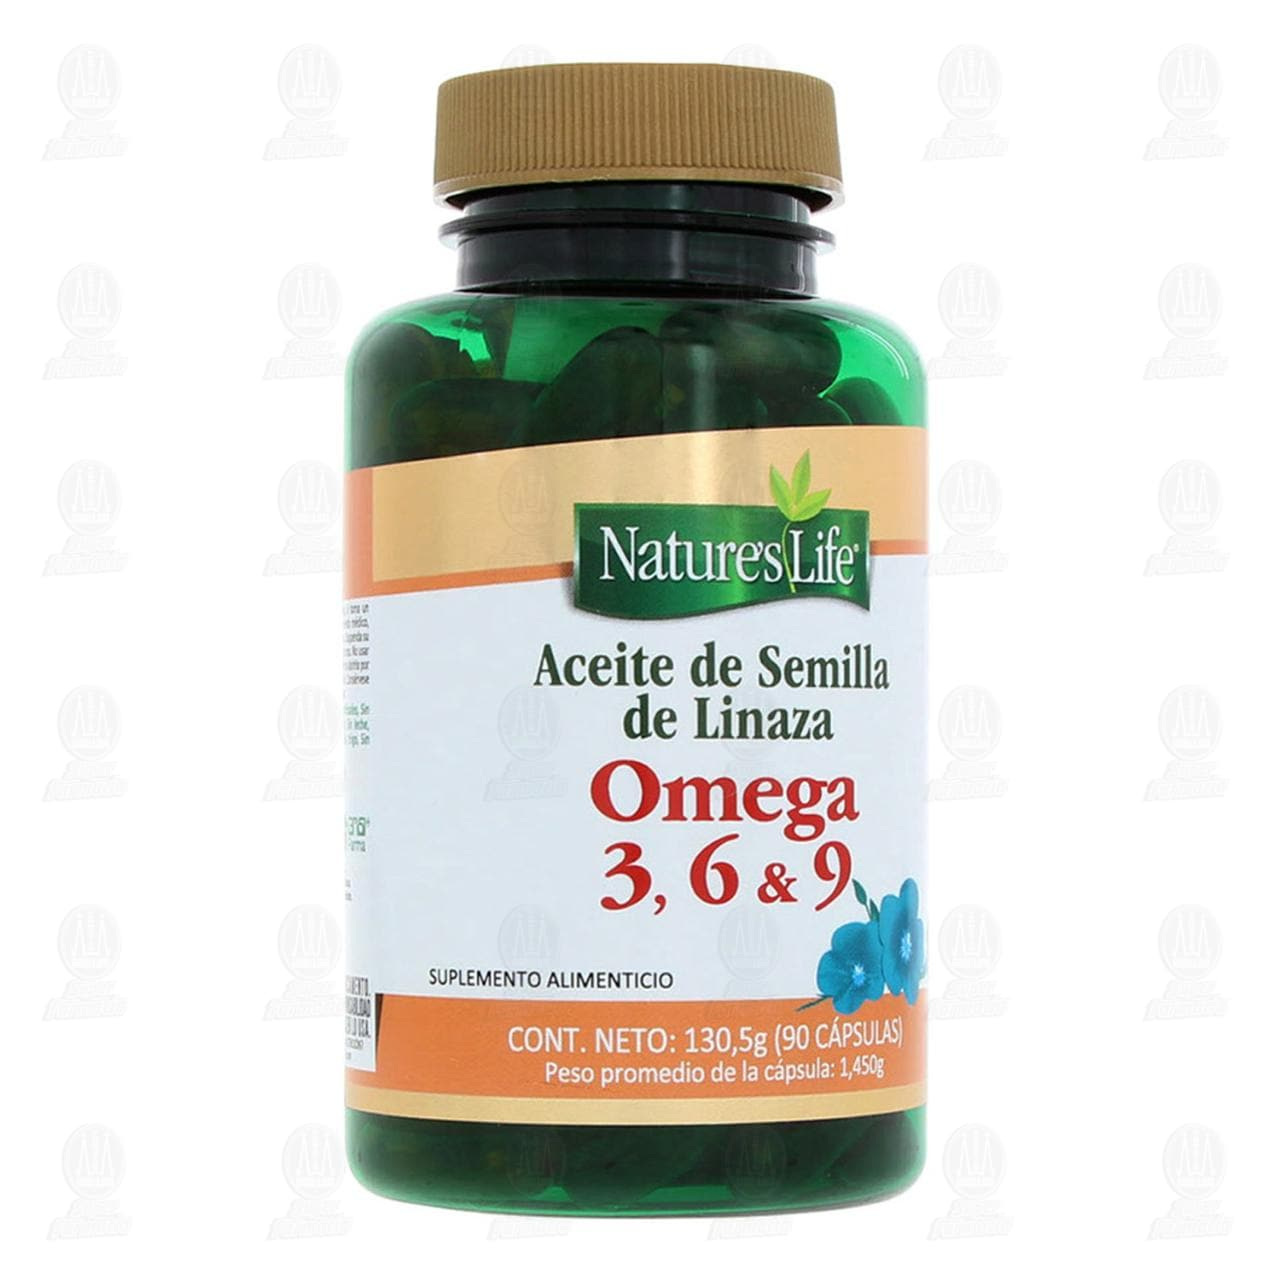 Comprar Omega 3,6 Y 9 Nature´s Life en Farmacias Guadalajara